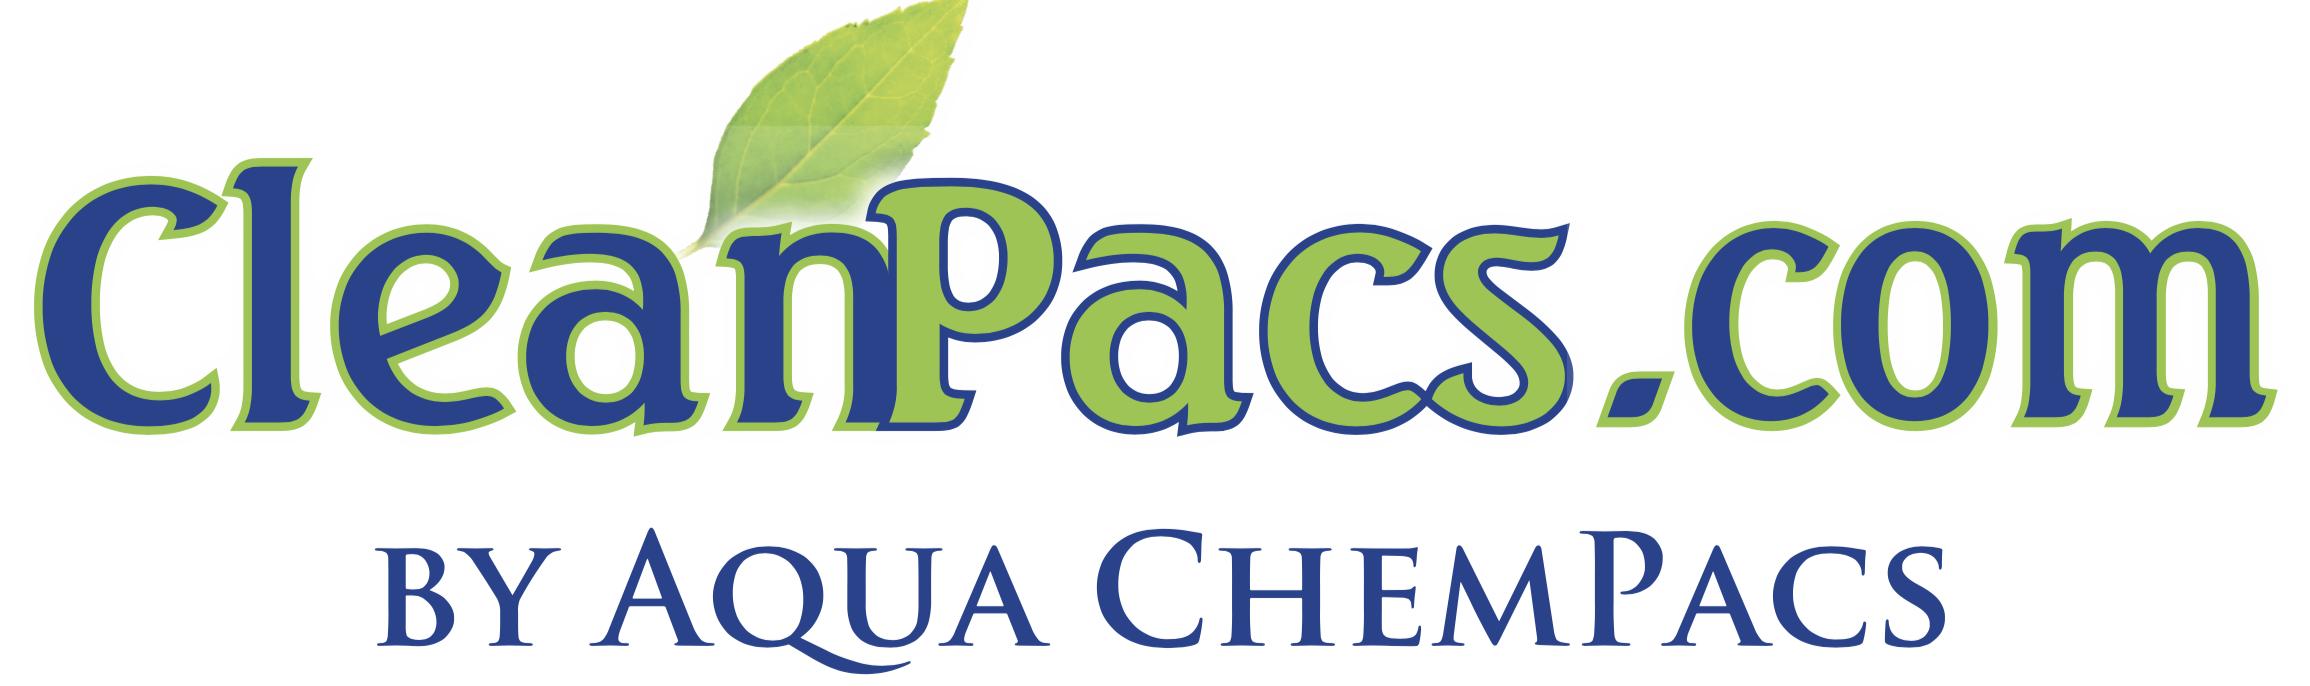 Chempac Sponsor